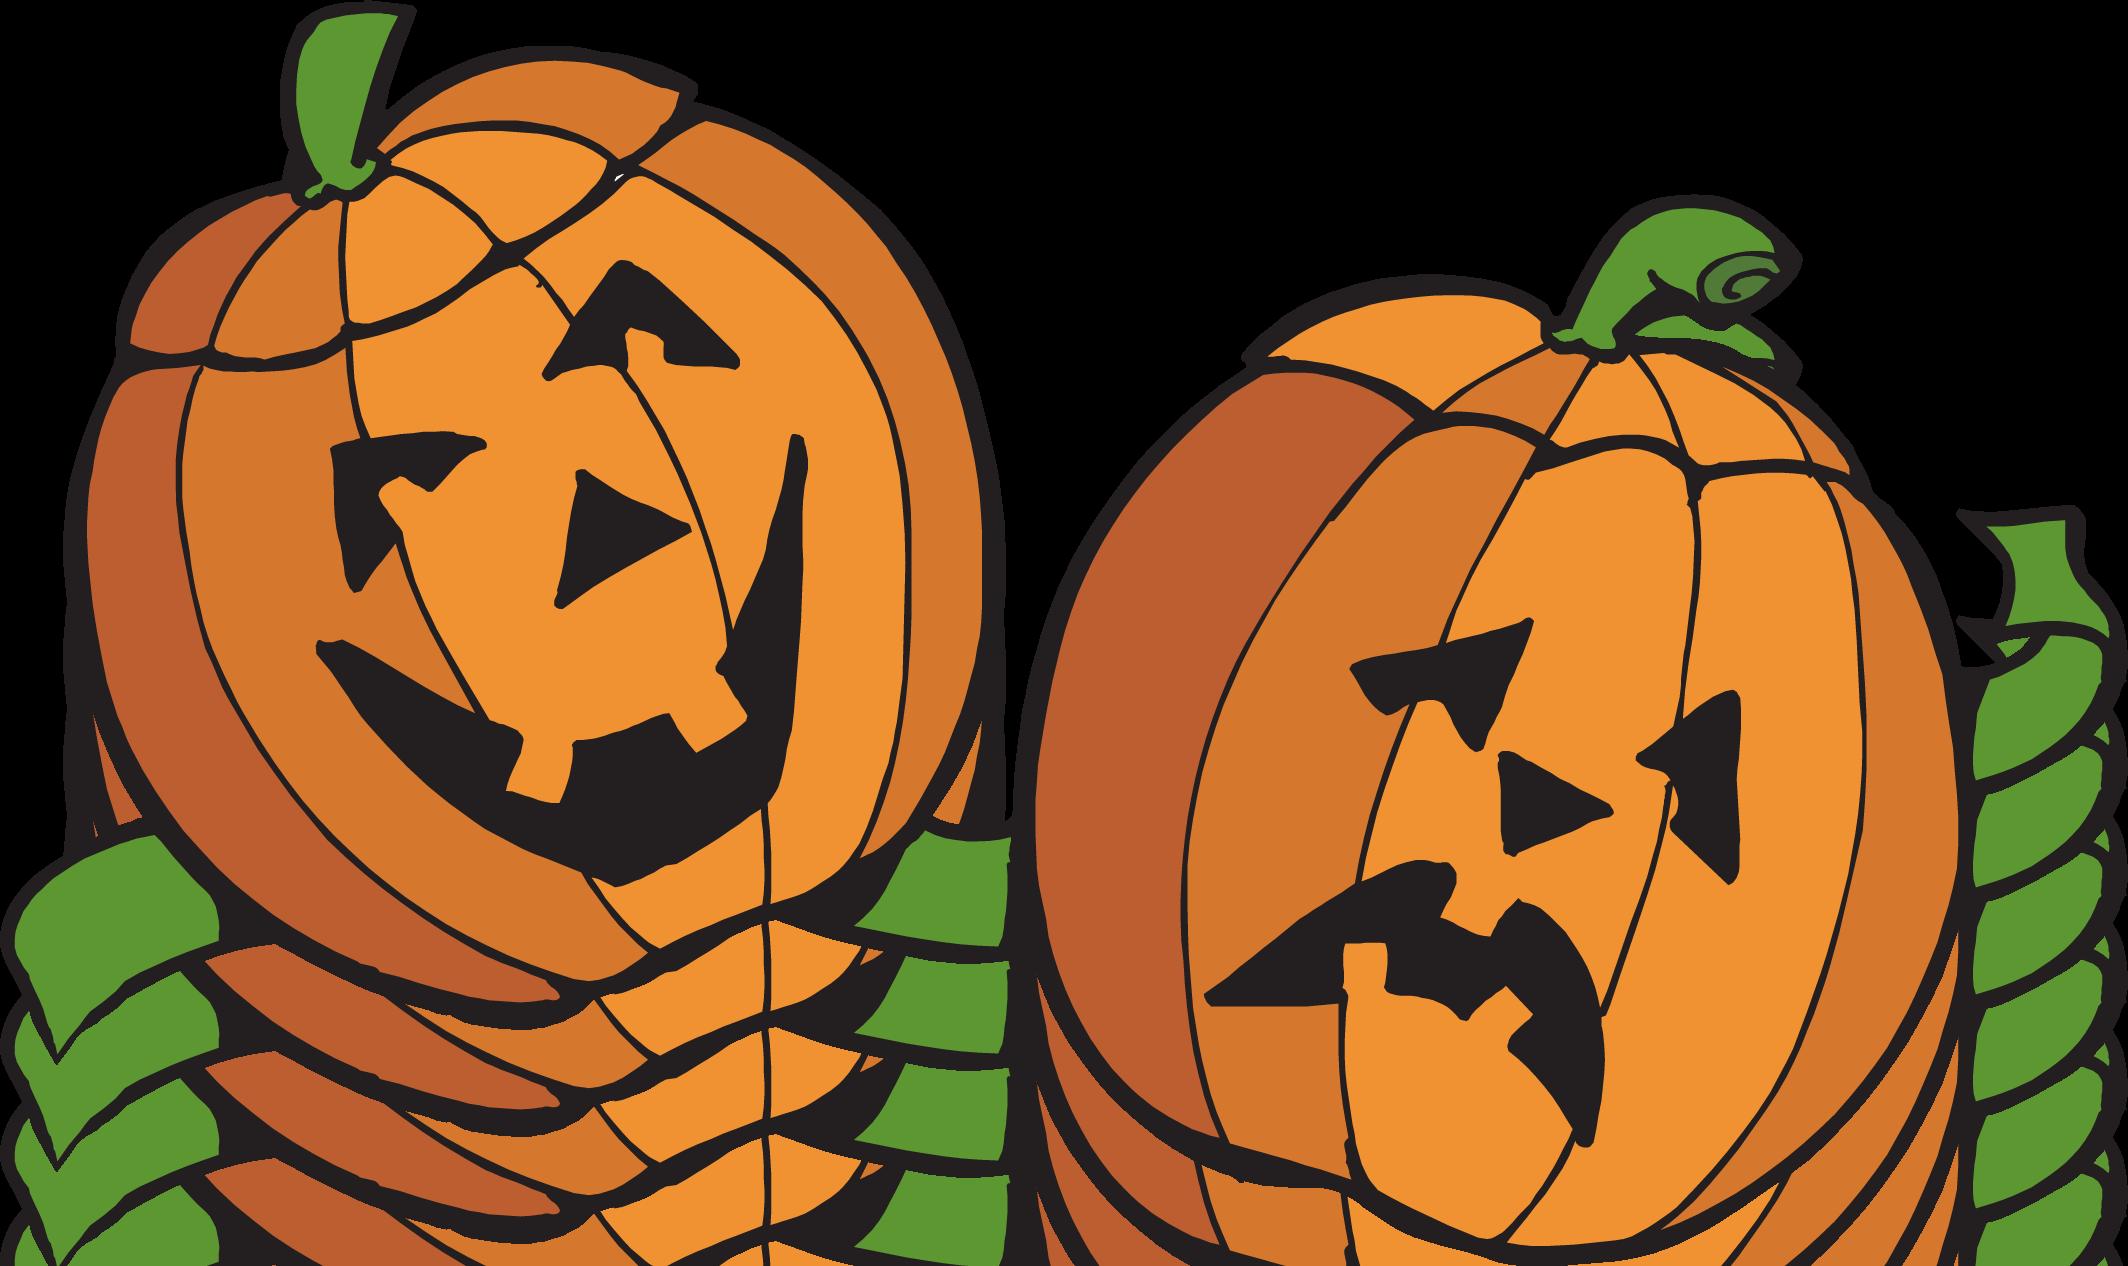 Happy And Sad Pumpkins - ClipArt Best - ClipArt Best